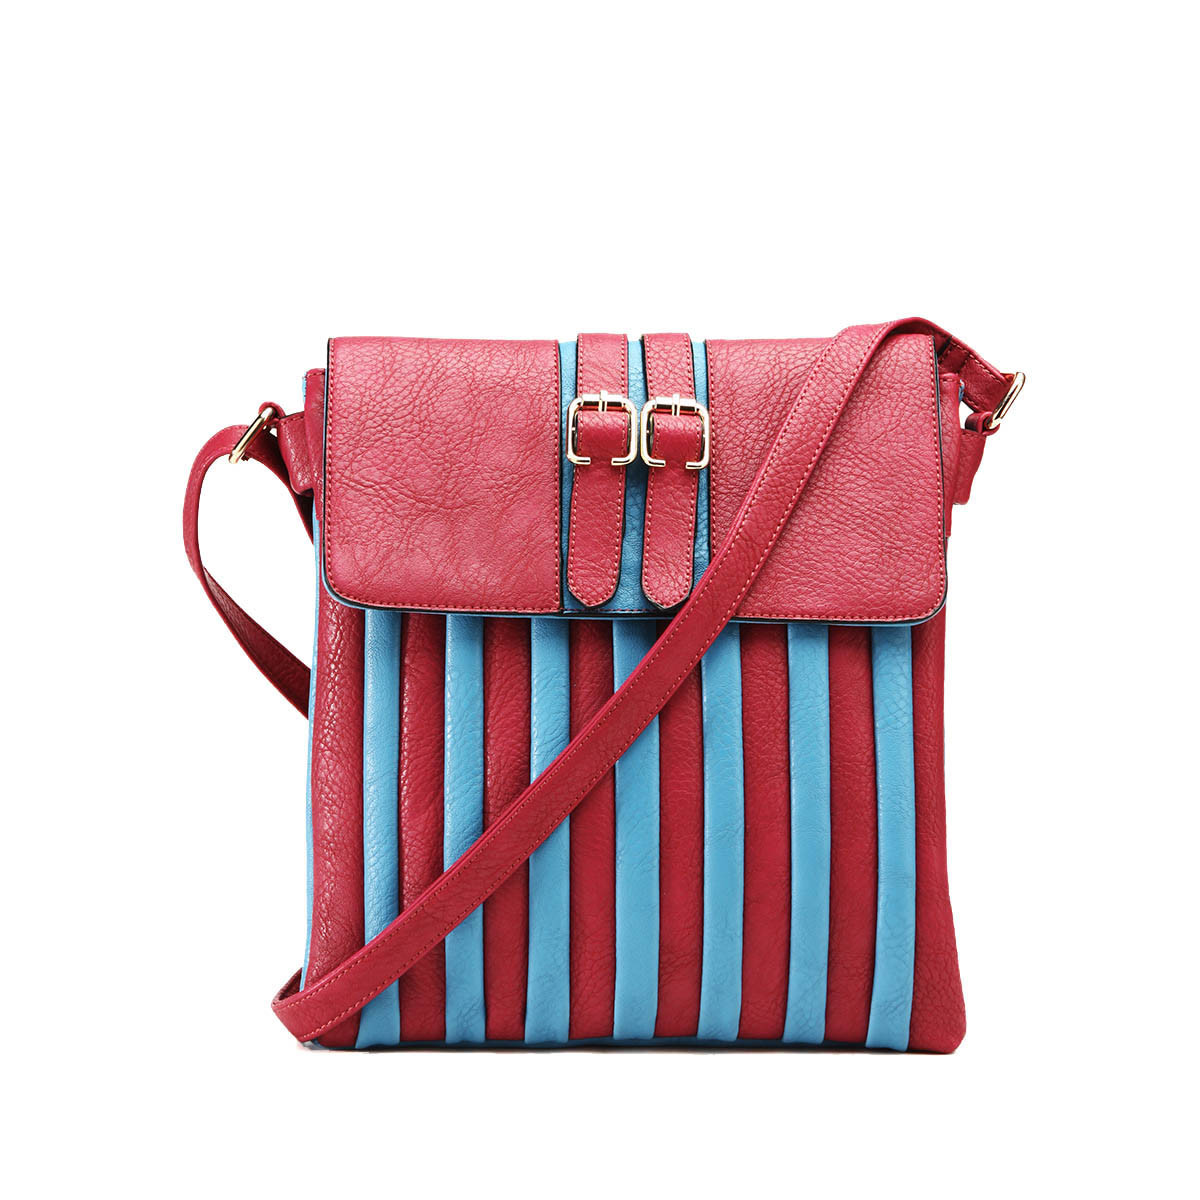 2015 Fashion Designer Woman Messenger Bag (MBNO038070)